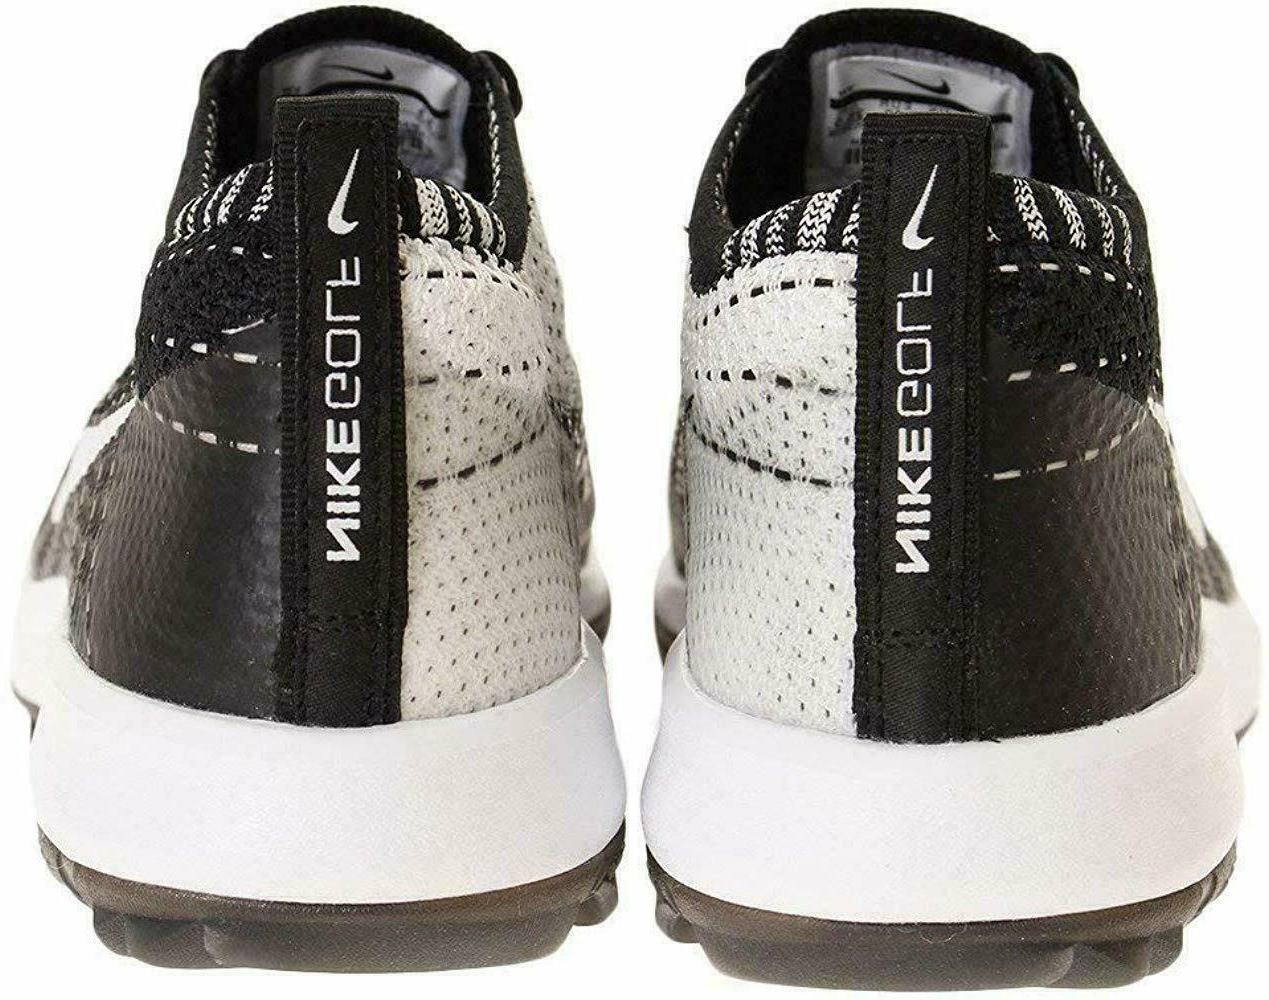 Nike G Men's Golf Shoes 001 Black NIB $175